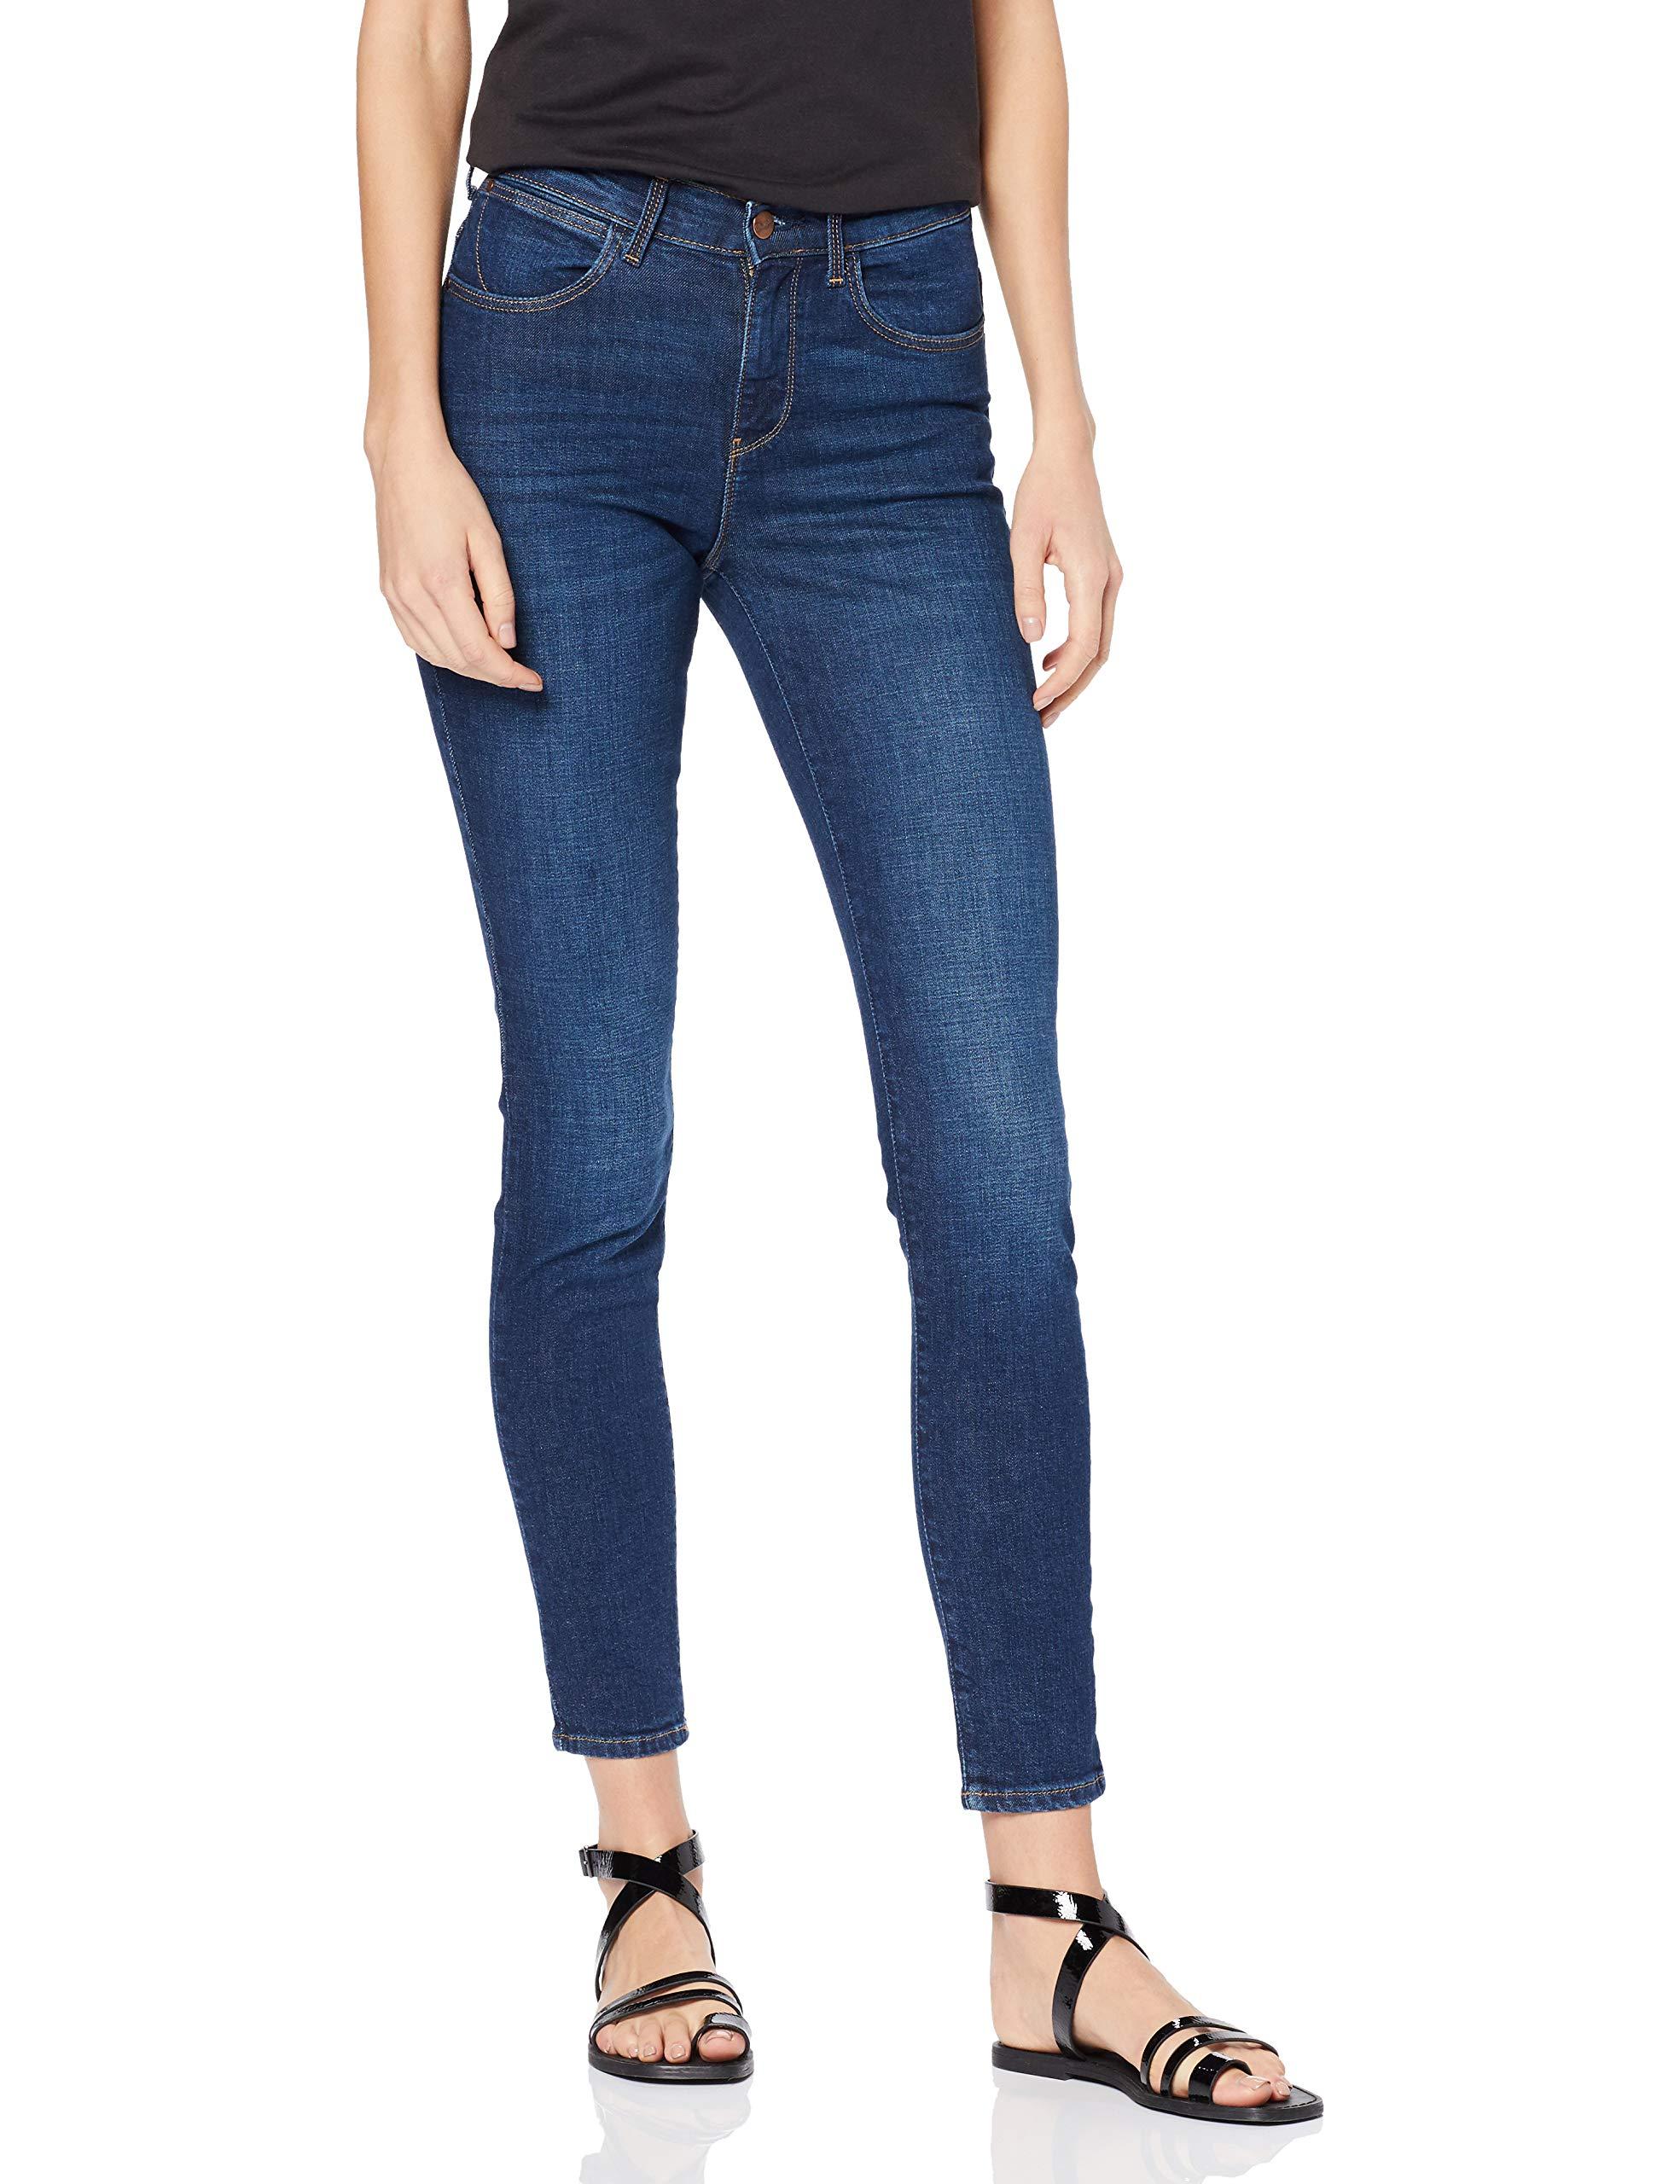 Skinny WranglerHigh Rise l32 Femme Pike Jeans 34mW30 Bleublue KcJlF1